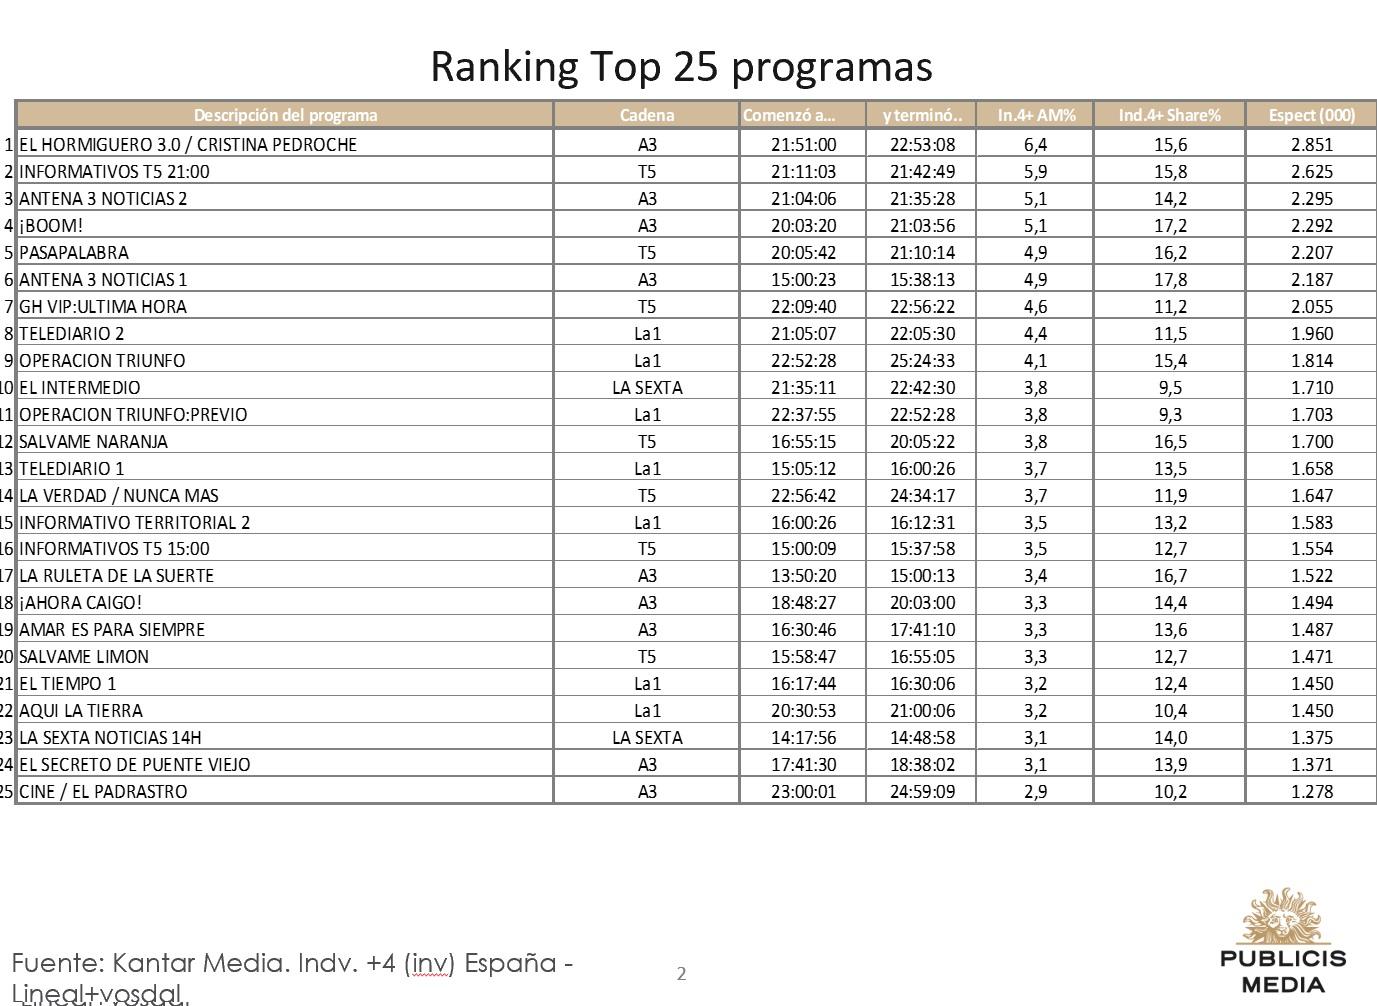 http://www.programapublicidad.com/wp-content/uploads/2018/12/Top-25-Publicis-media-12-dic-2018-programapublicidad-muy-grande.jpg